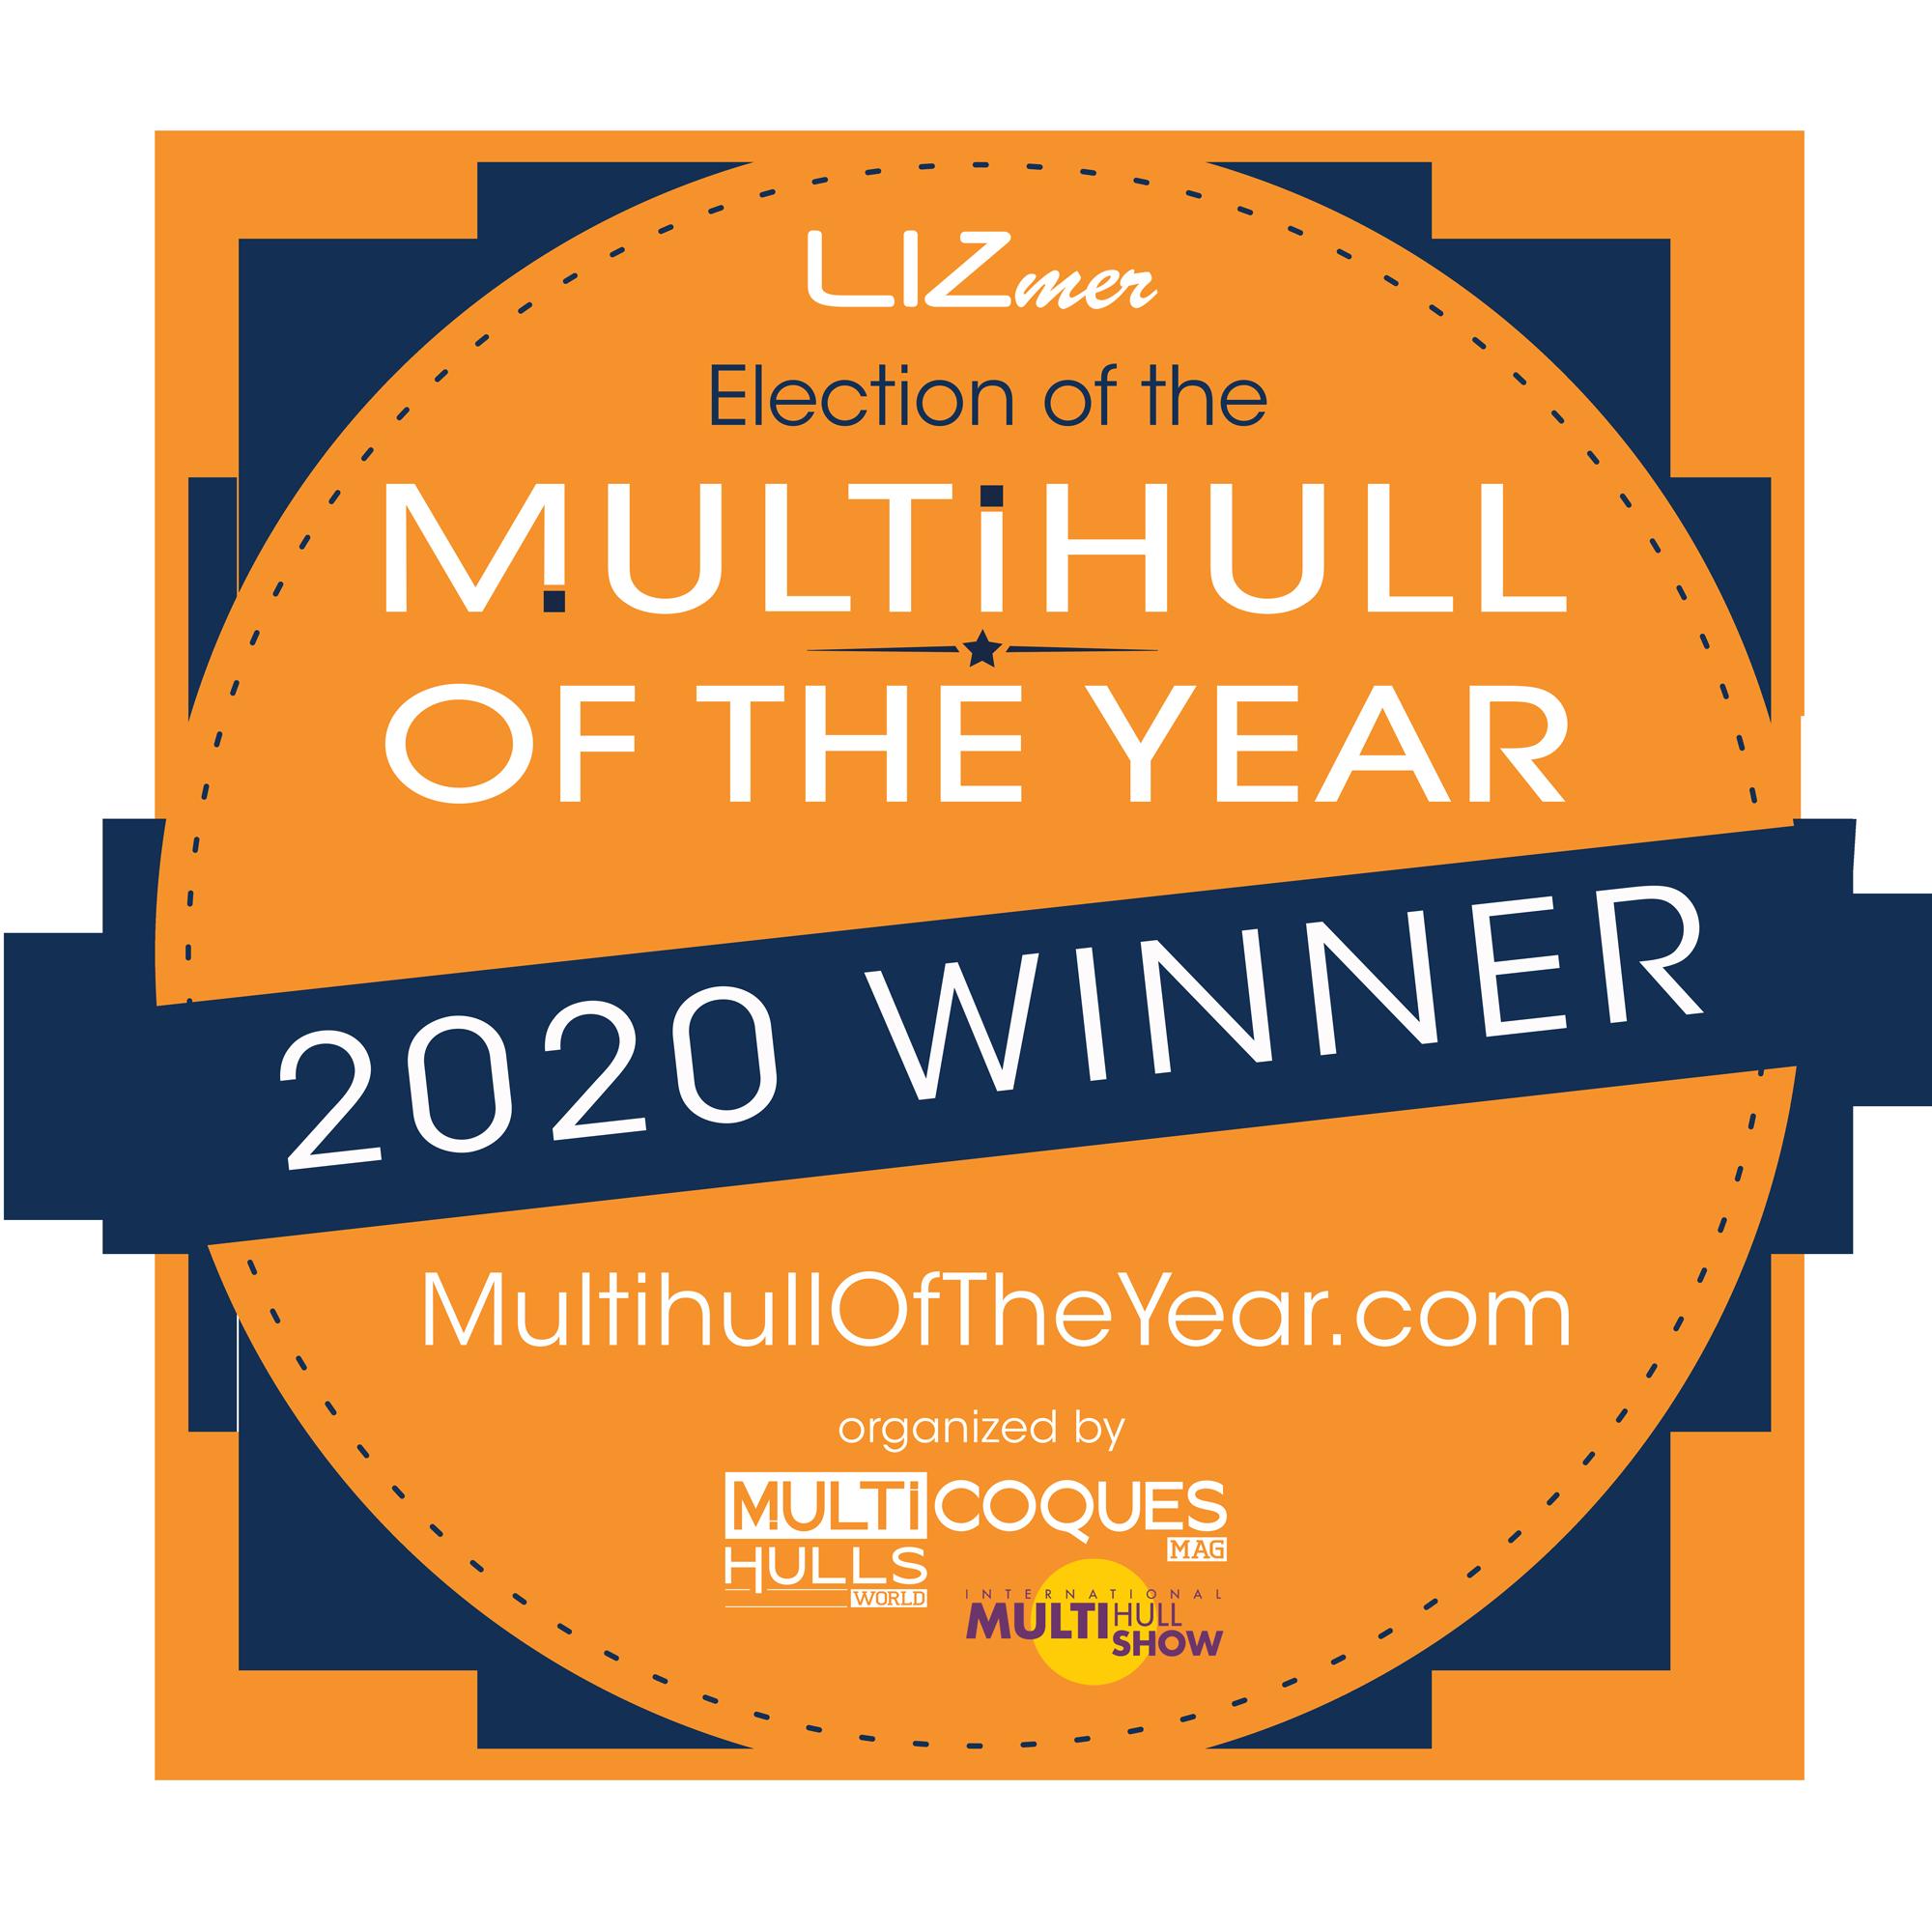 Multihull of the Year 2020 Winner